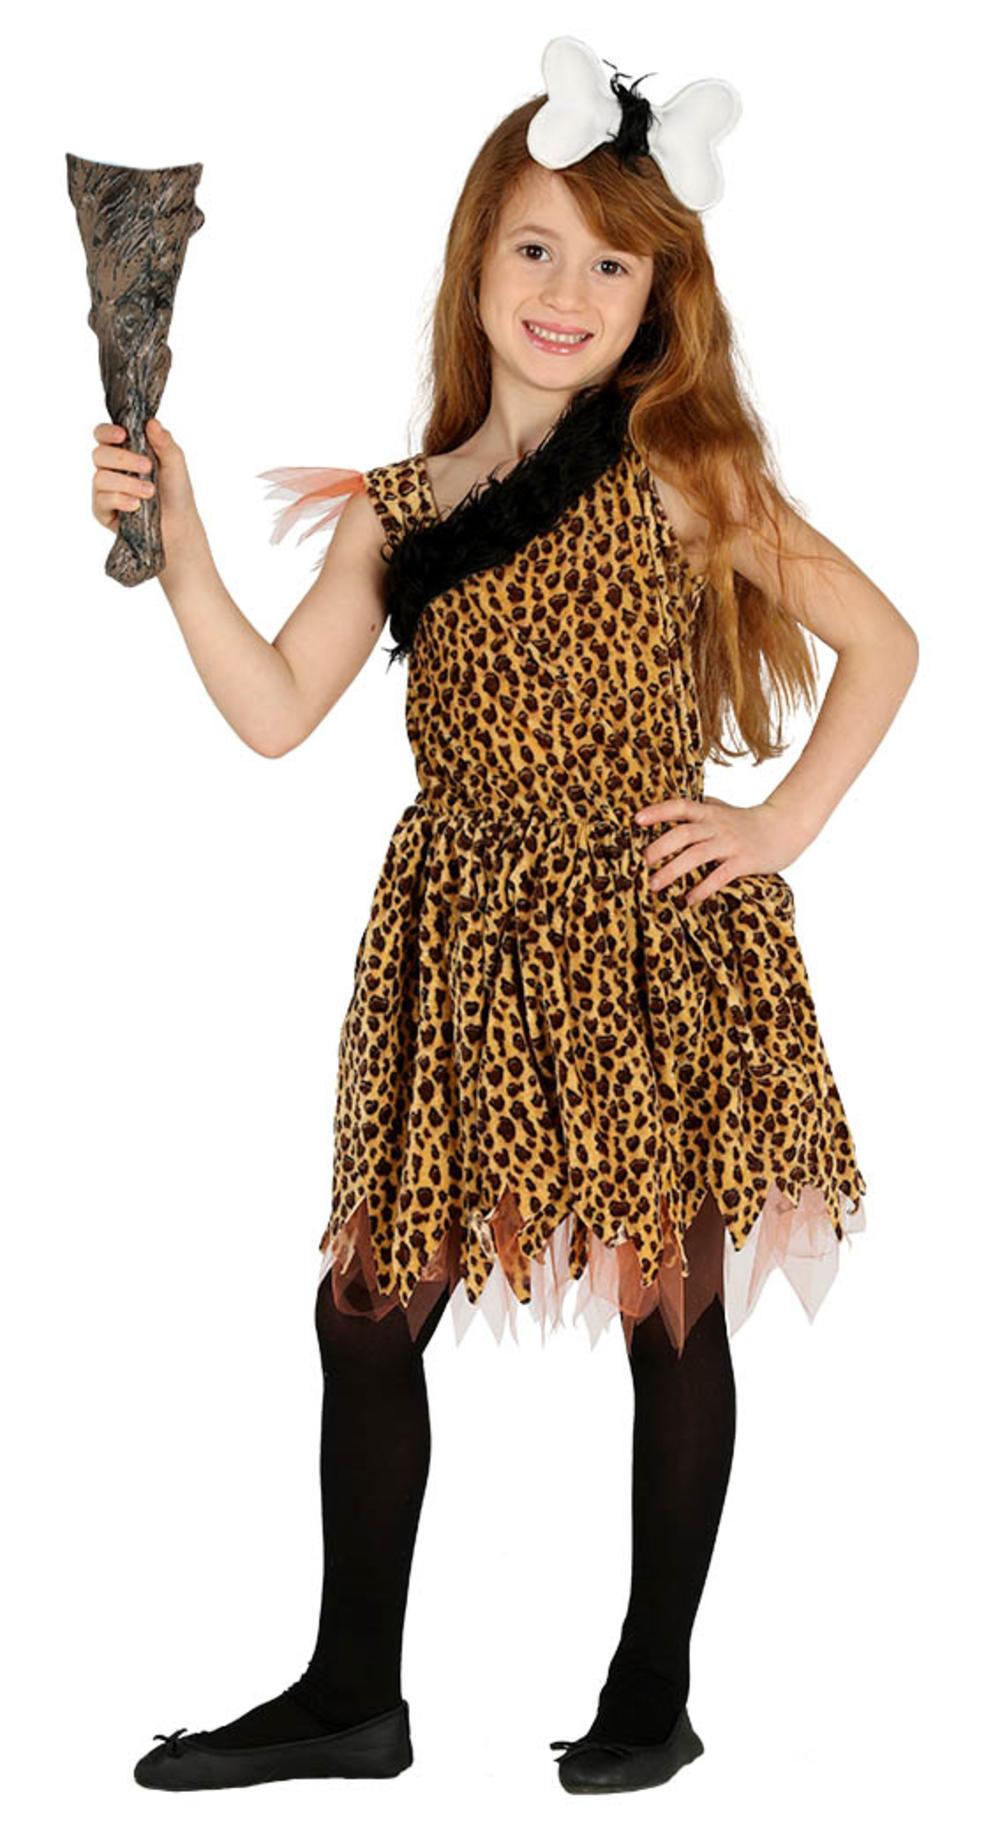 Cavegirl Girls Fancy Dress Prehistoric Stone Age Cave Girl Kids Book Day Costume